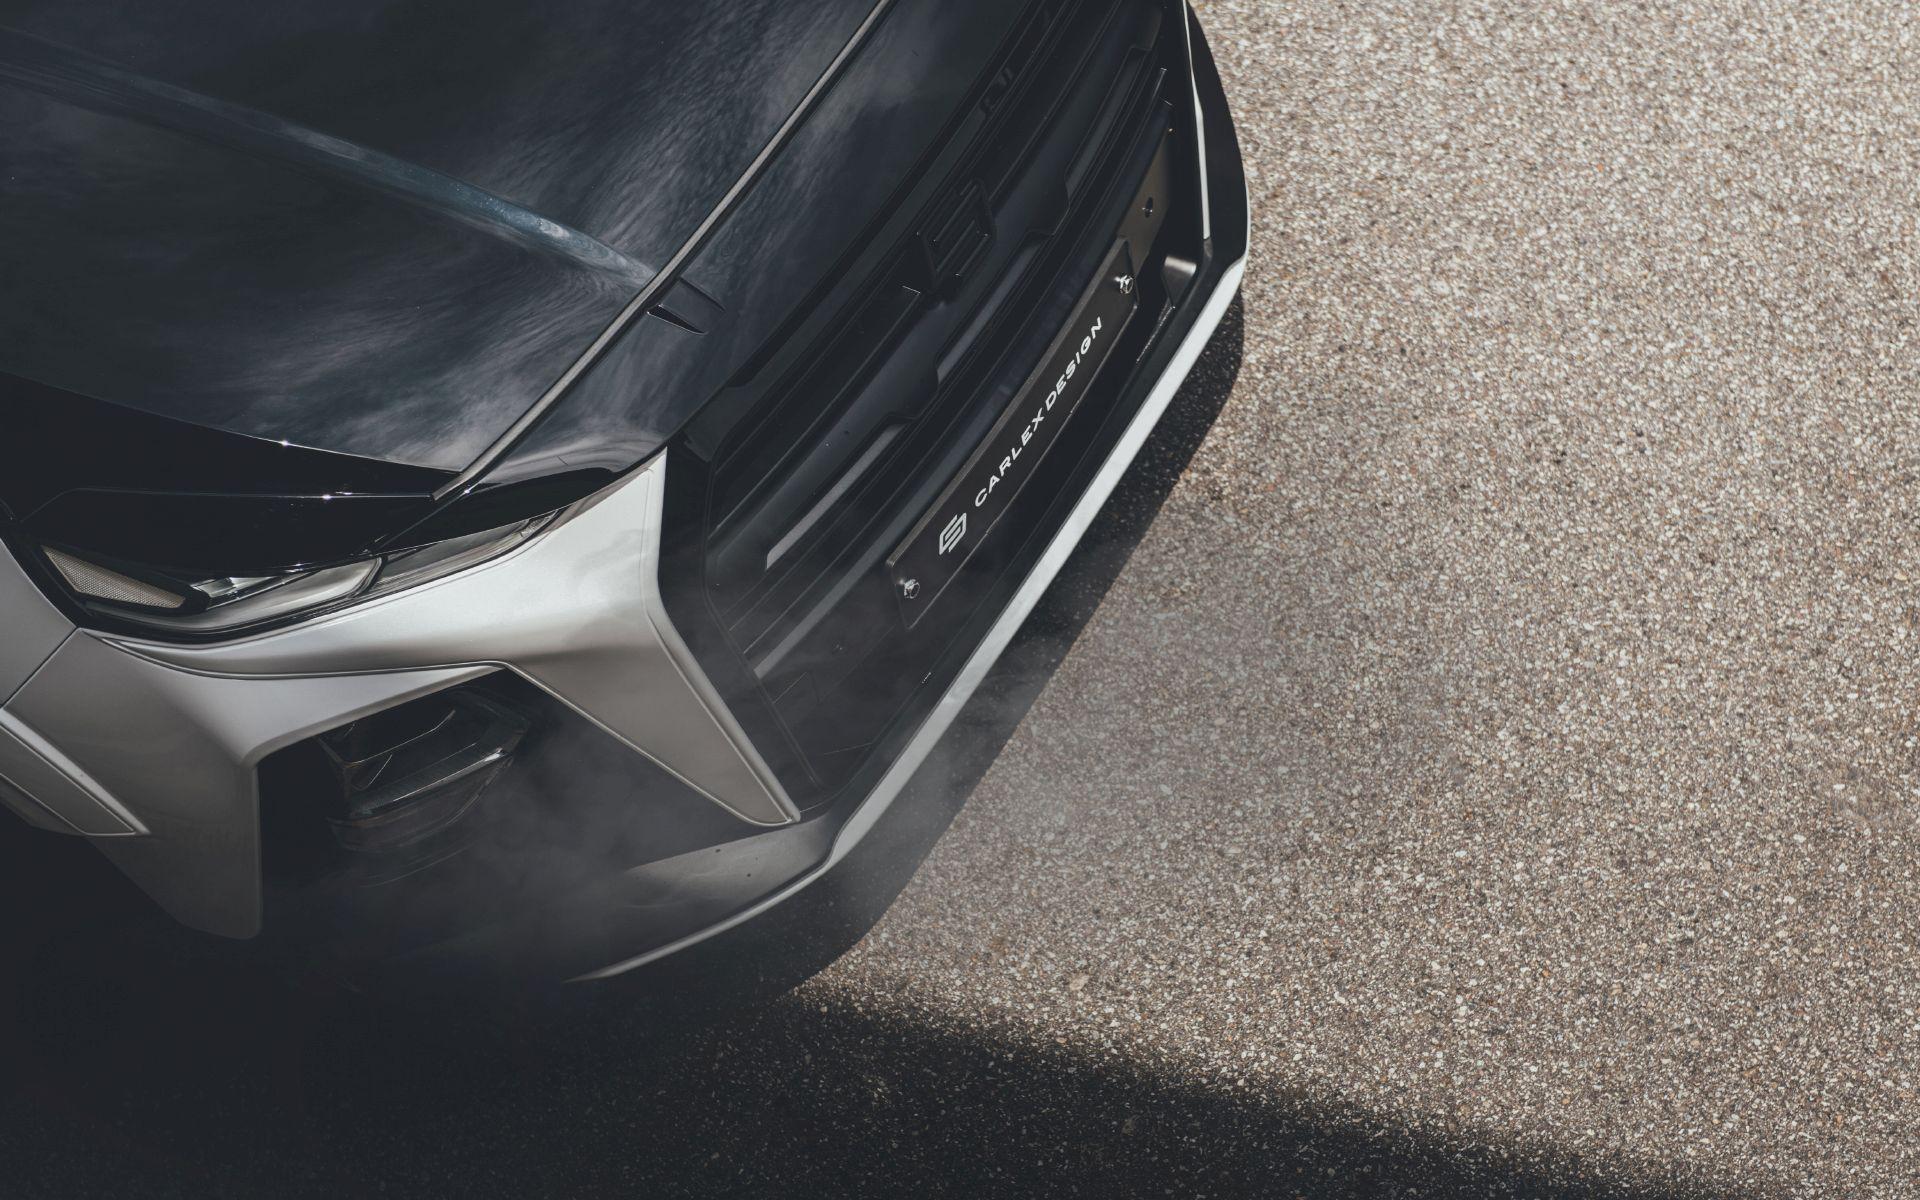 Hyundai-Santa-Fe-by-Carlex-Design-31